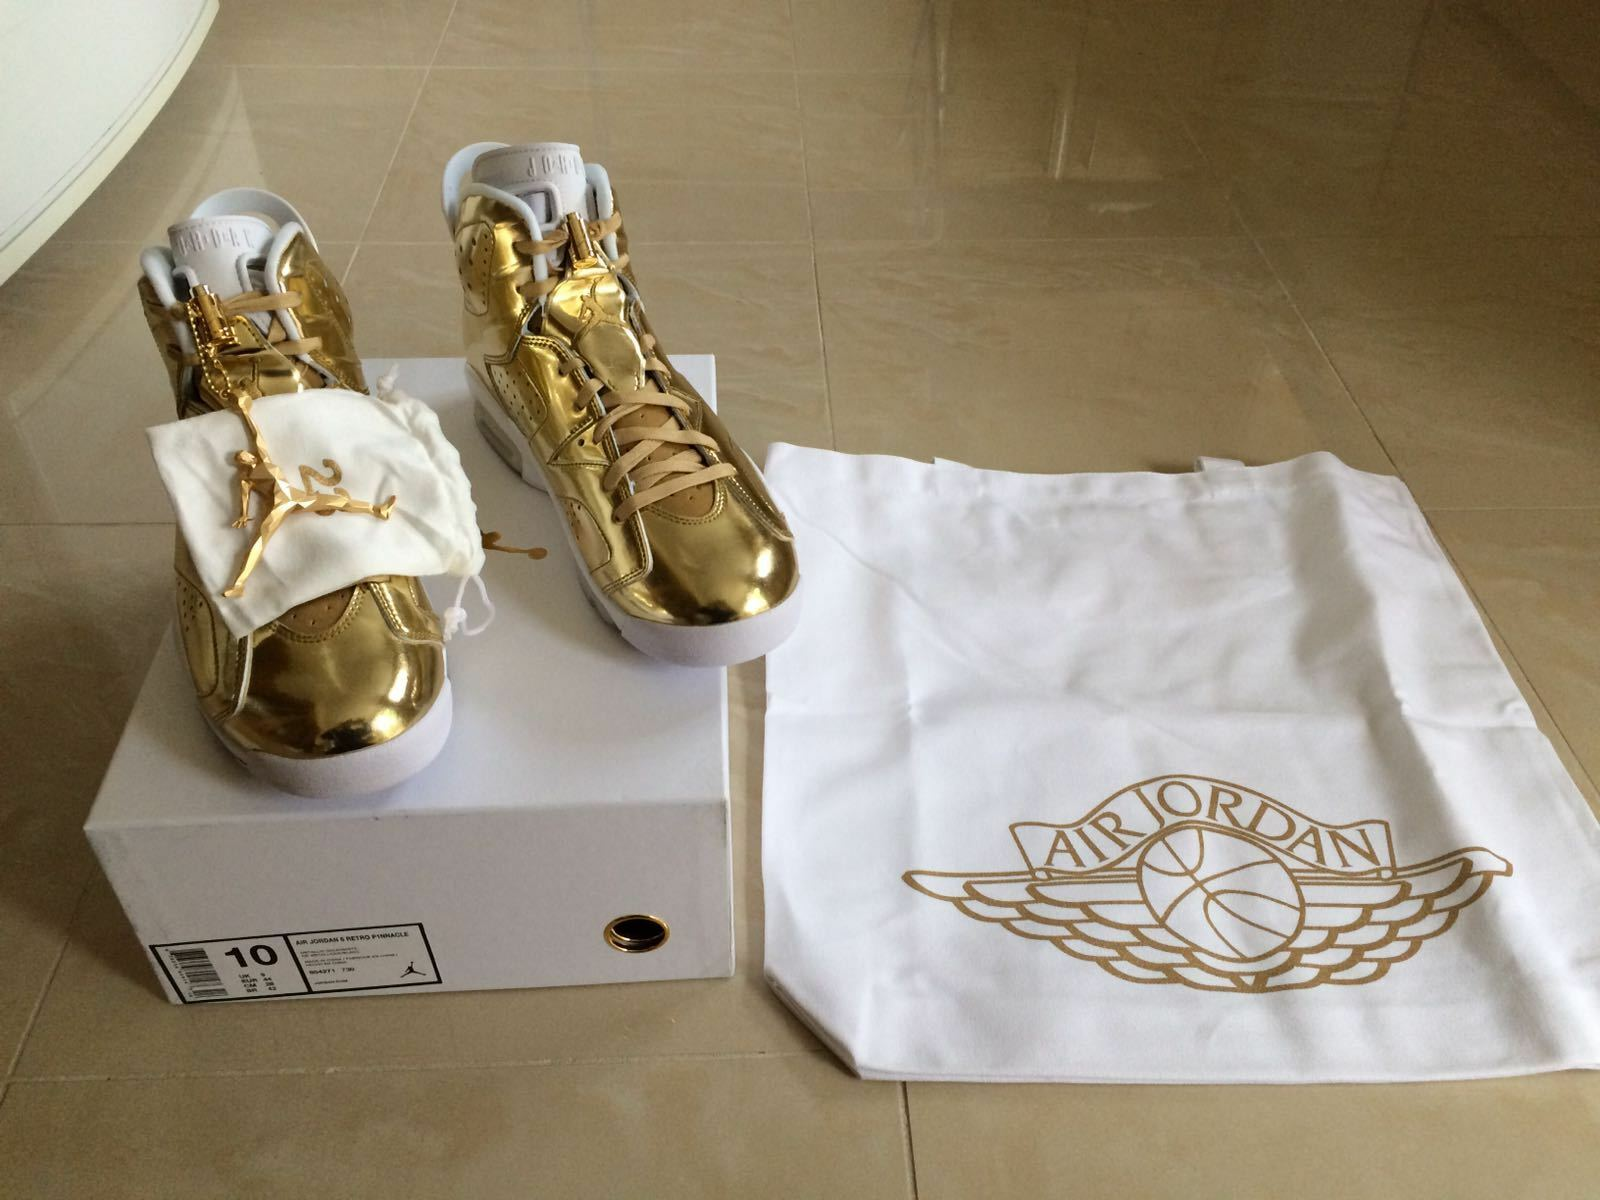 NIKE AIR JORDAN 6 pinnacle doré métallisé édition limitée taille uk 9.5 new